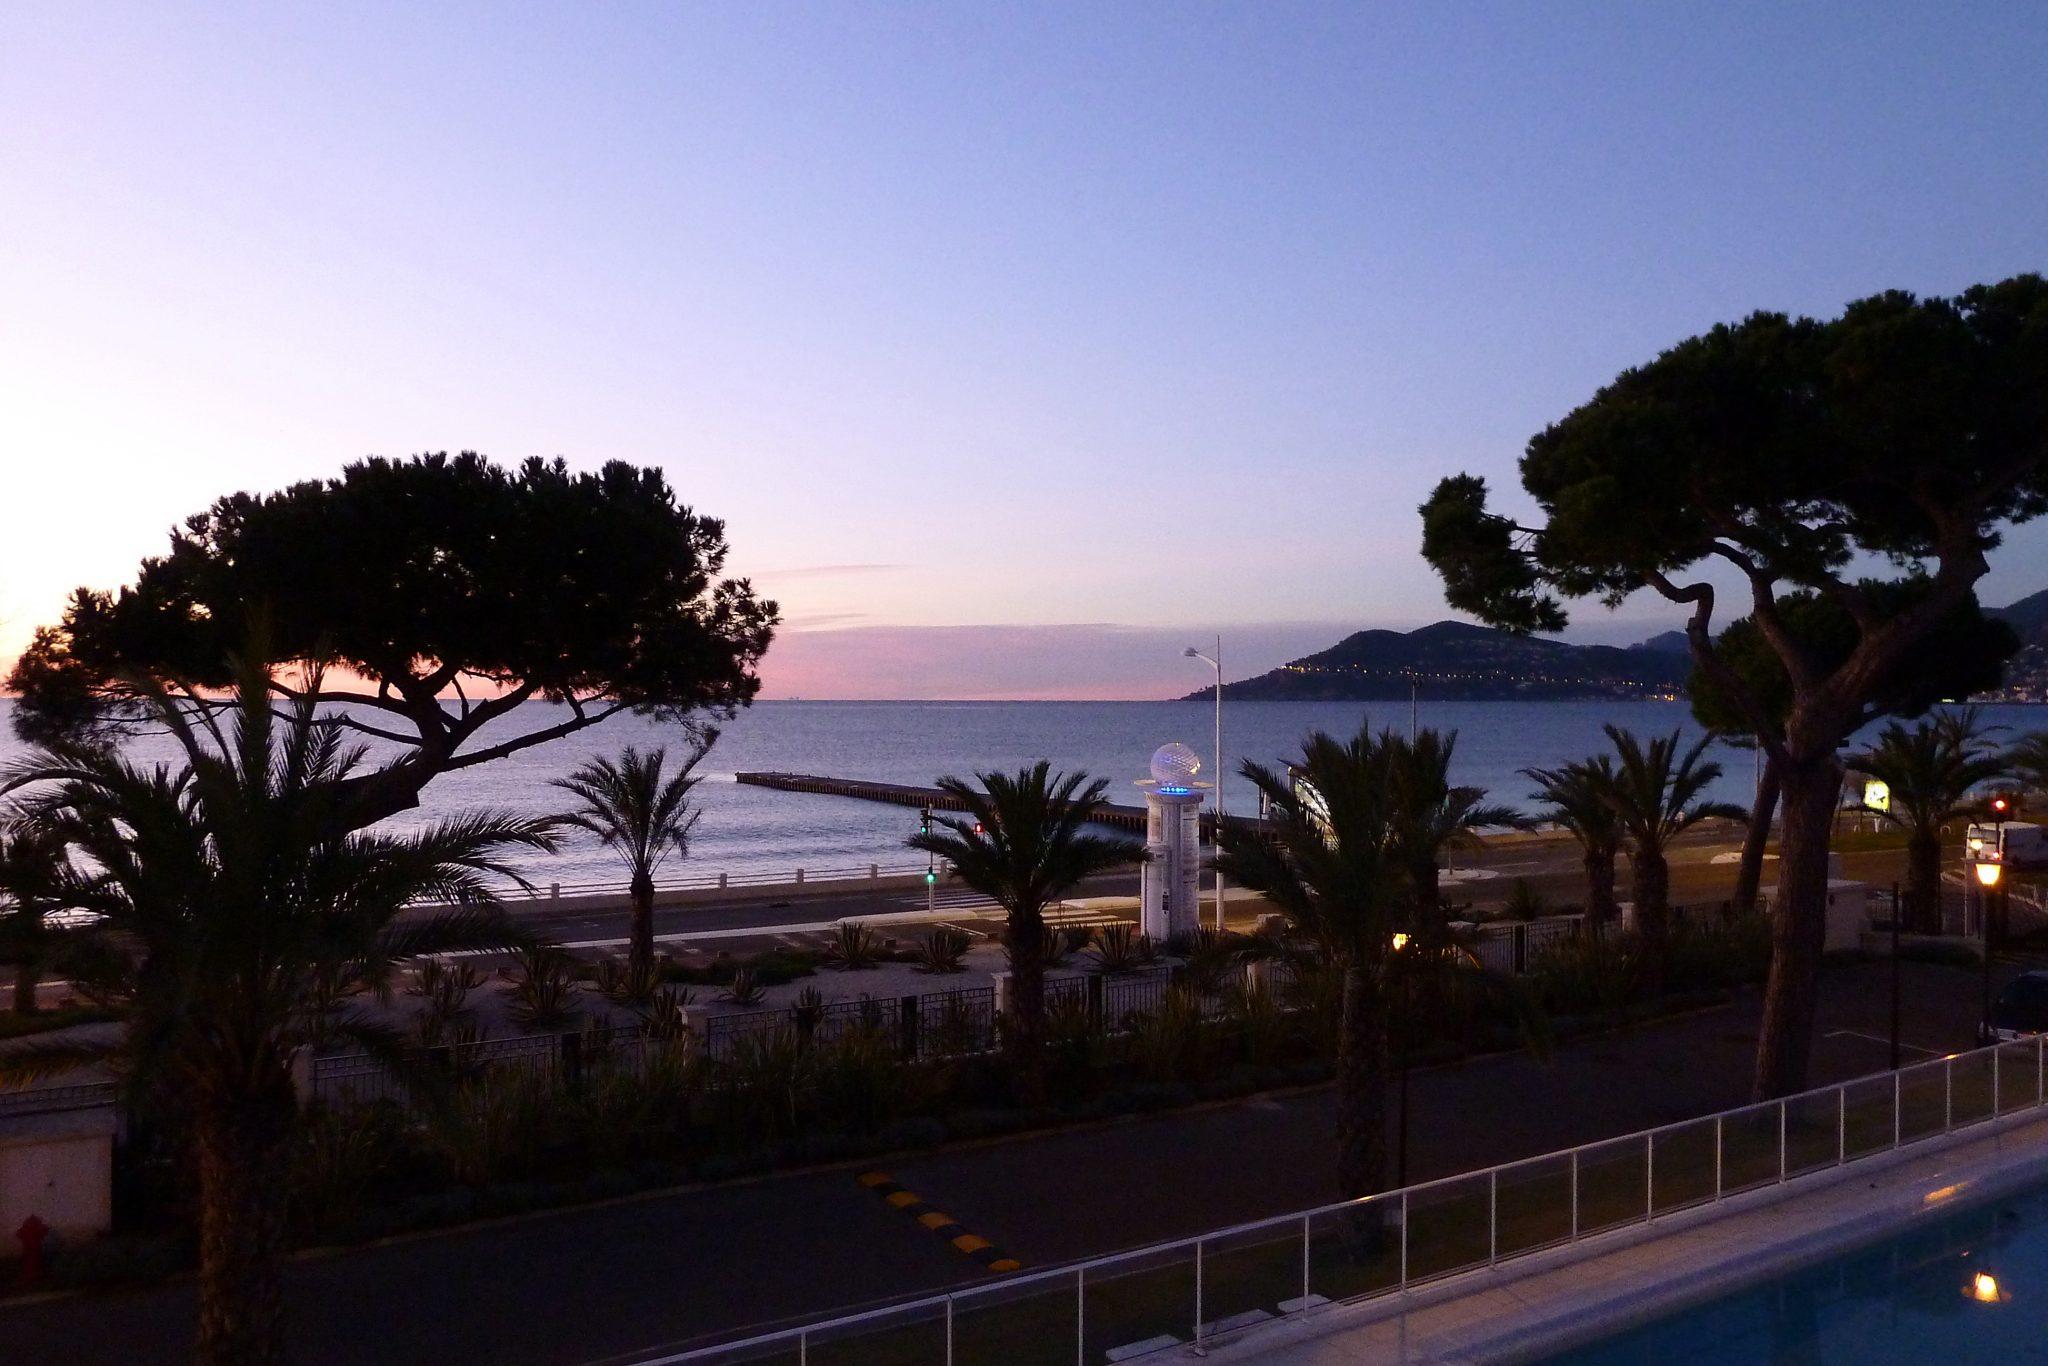 Cannes La Bocca & Massif de l'Esterel warum Côte d'Azur